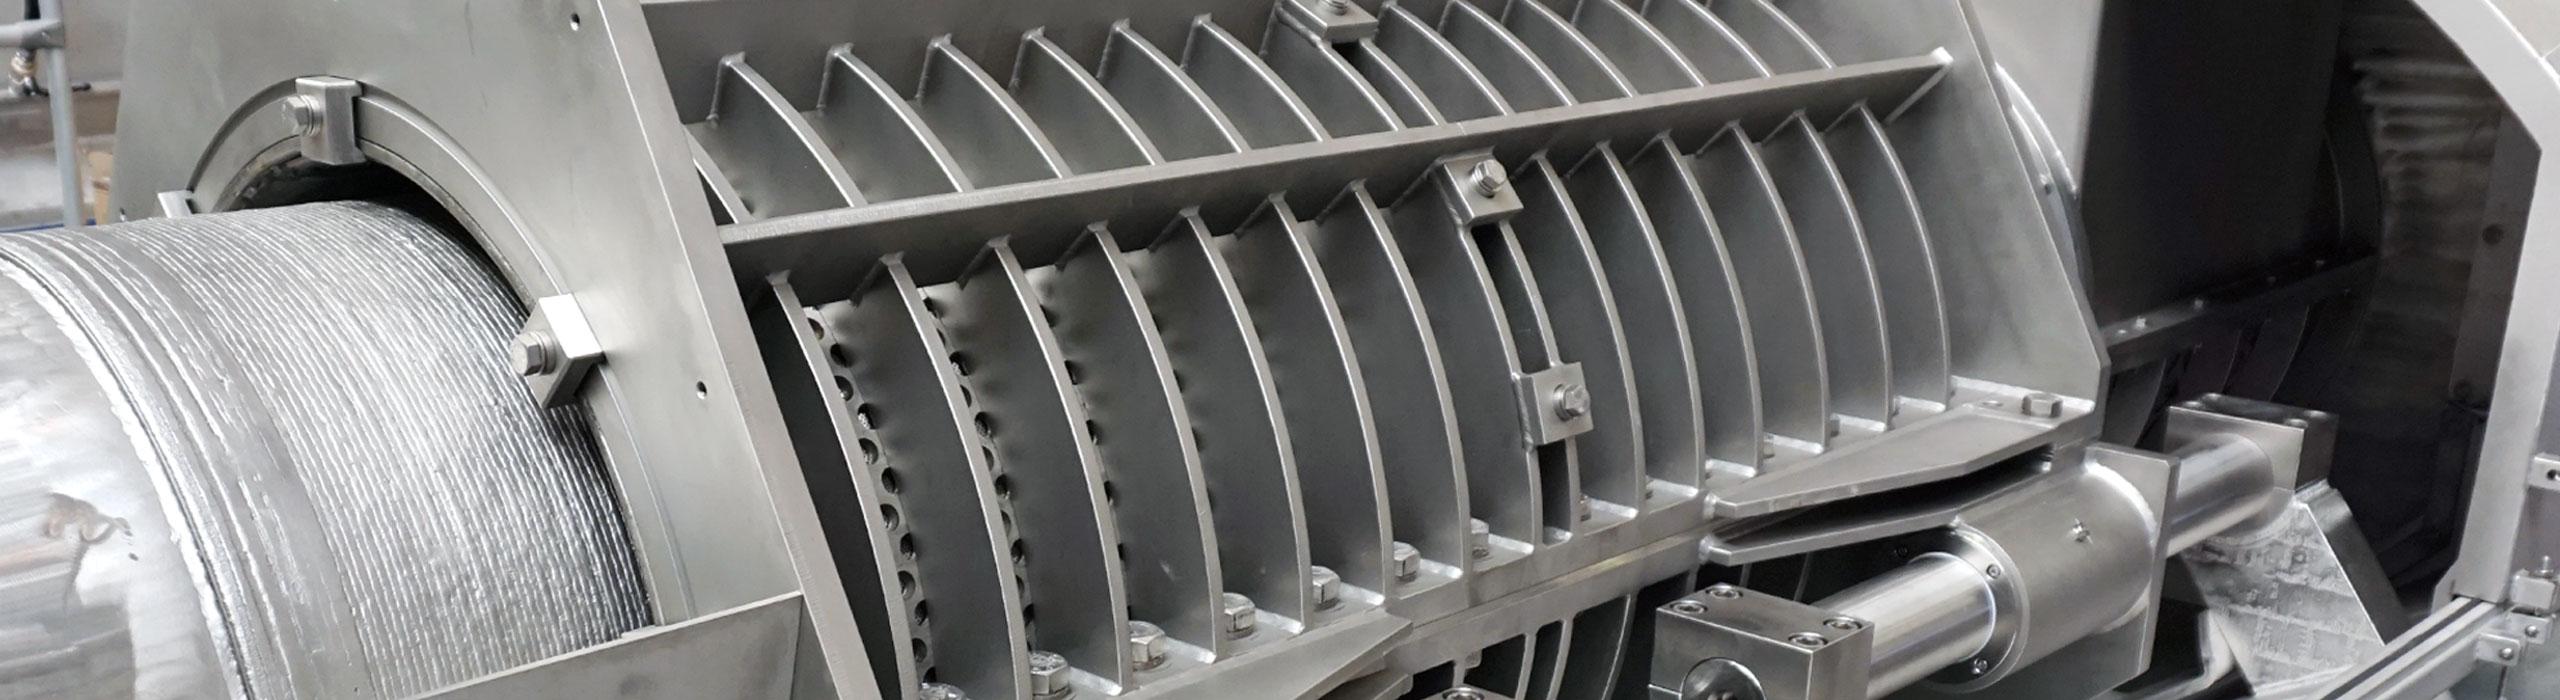 bellmer separation service overhauls